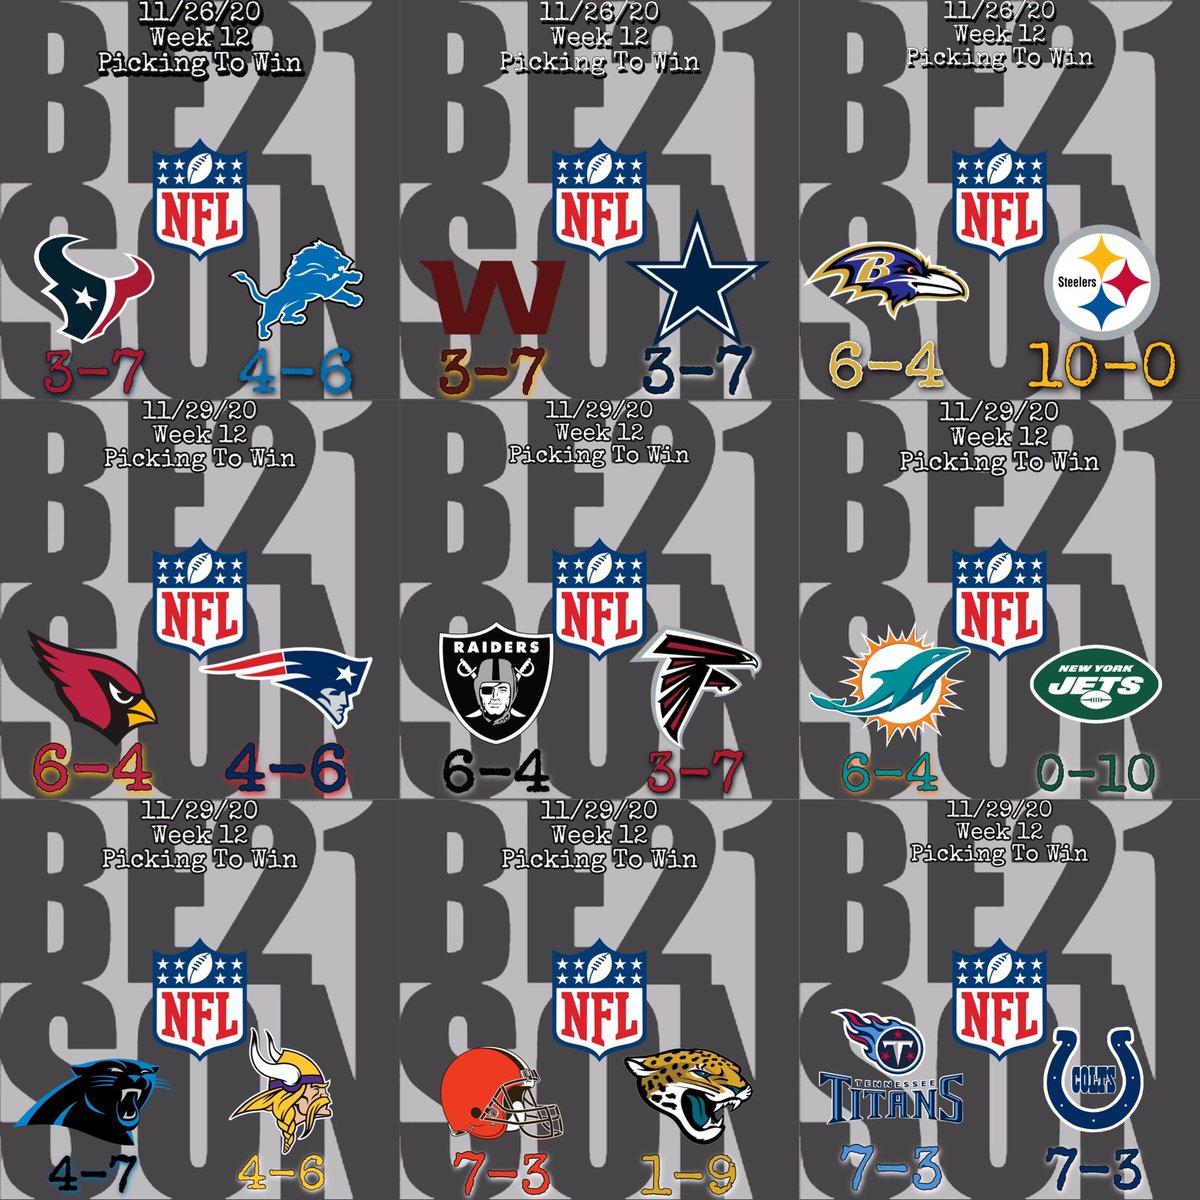 11/29/20 #NFL Week 12 Picks   #GoPats  #RaiderNation  #FinsUp  #Skol #Browns #Titans  #TogetherBlue  #BillsMafia  #RamsHouse  #Saints  #ChiefsKingdom  #GoPackGo  #Seahawks  #HereWeGo